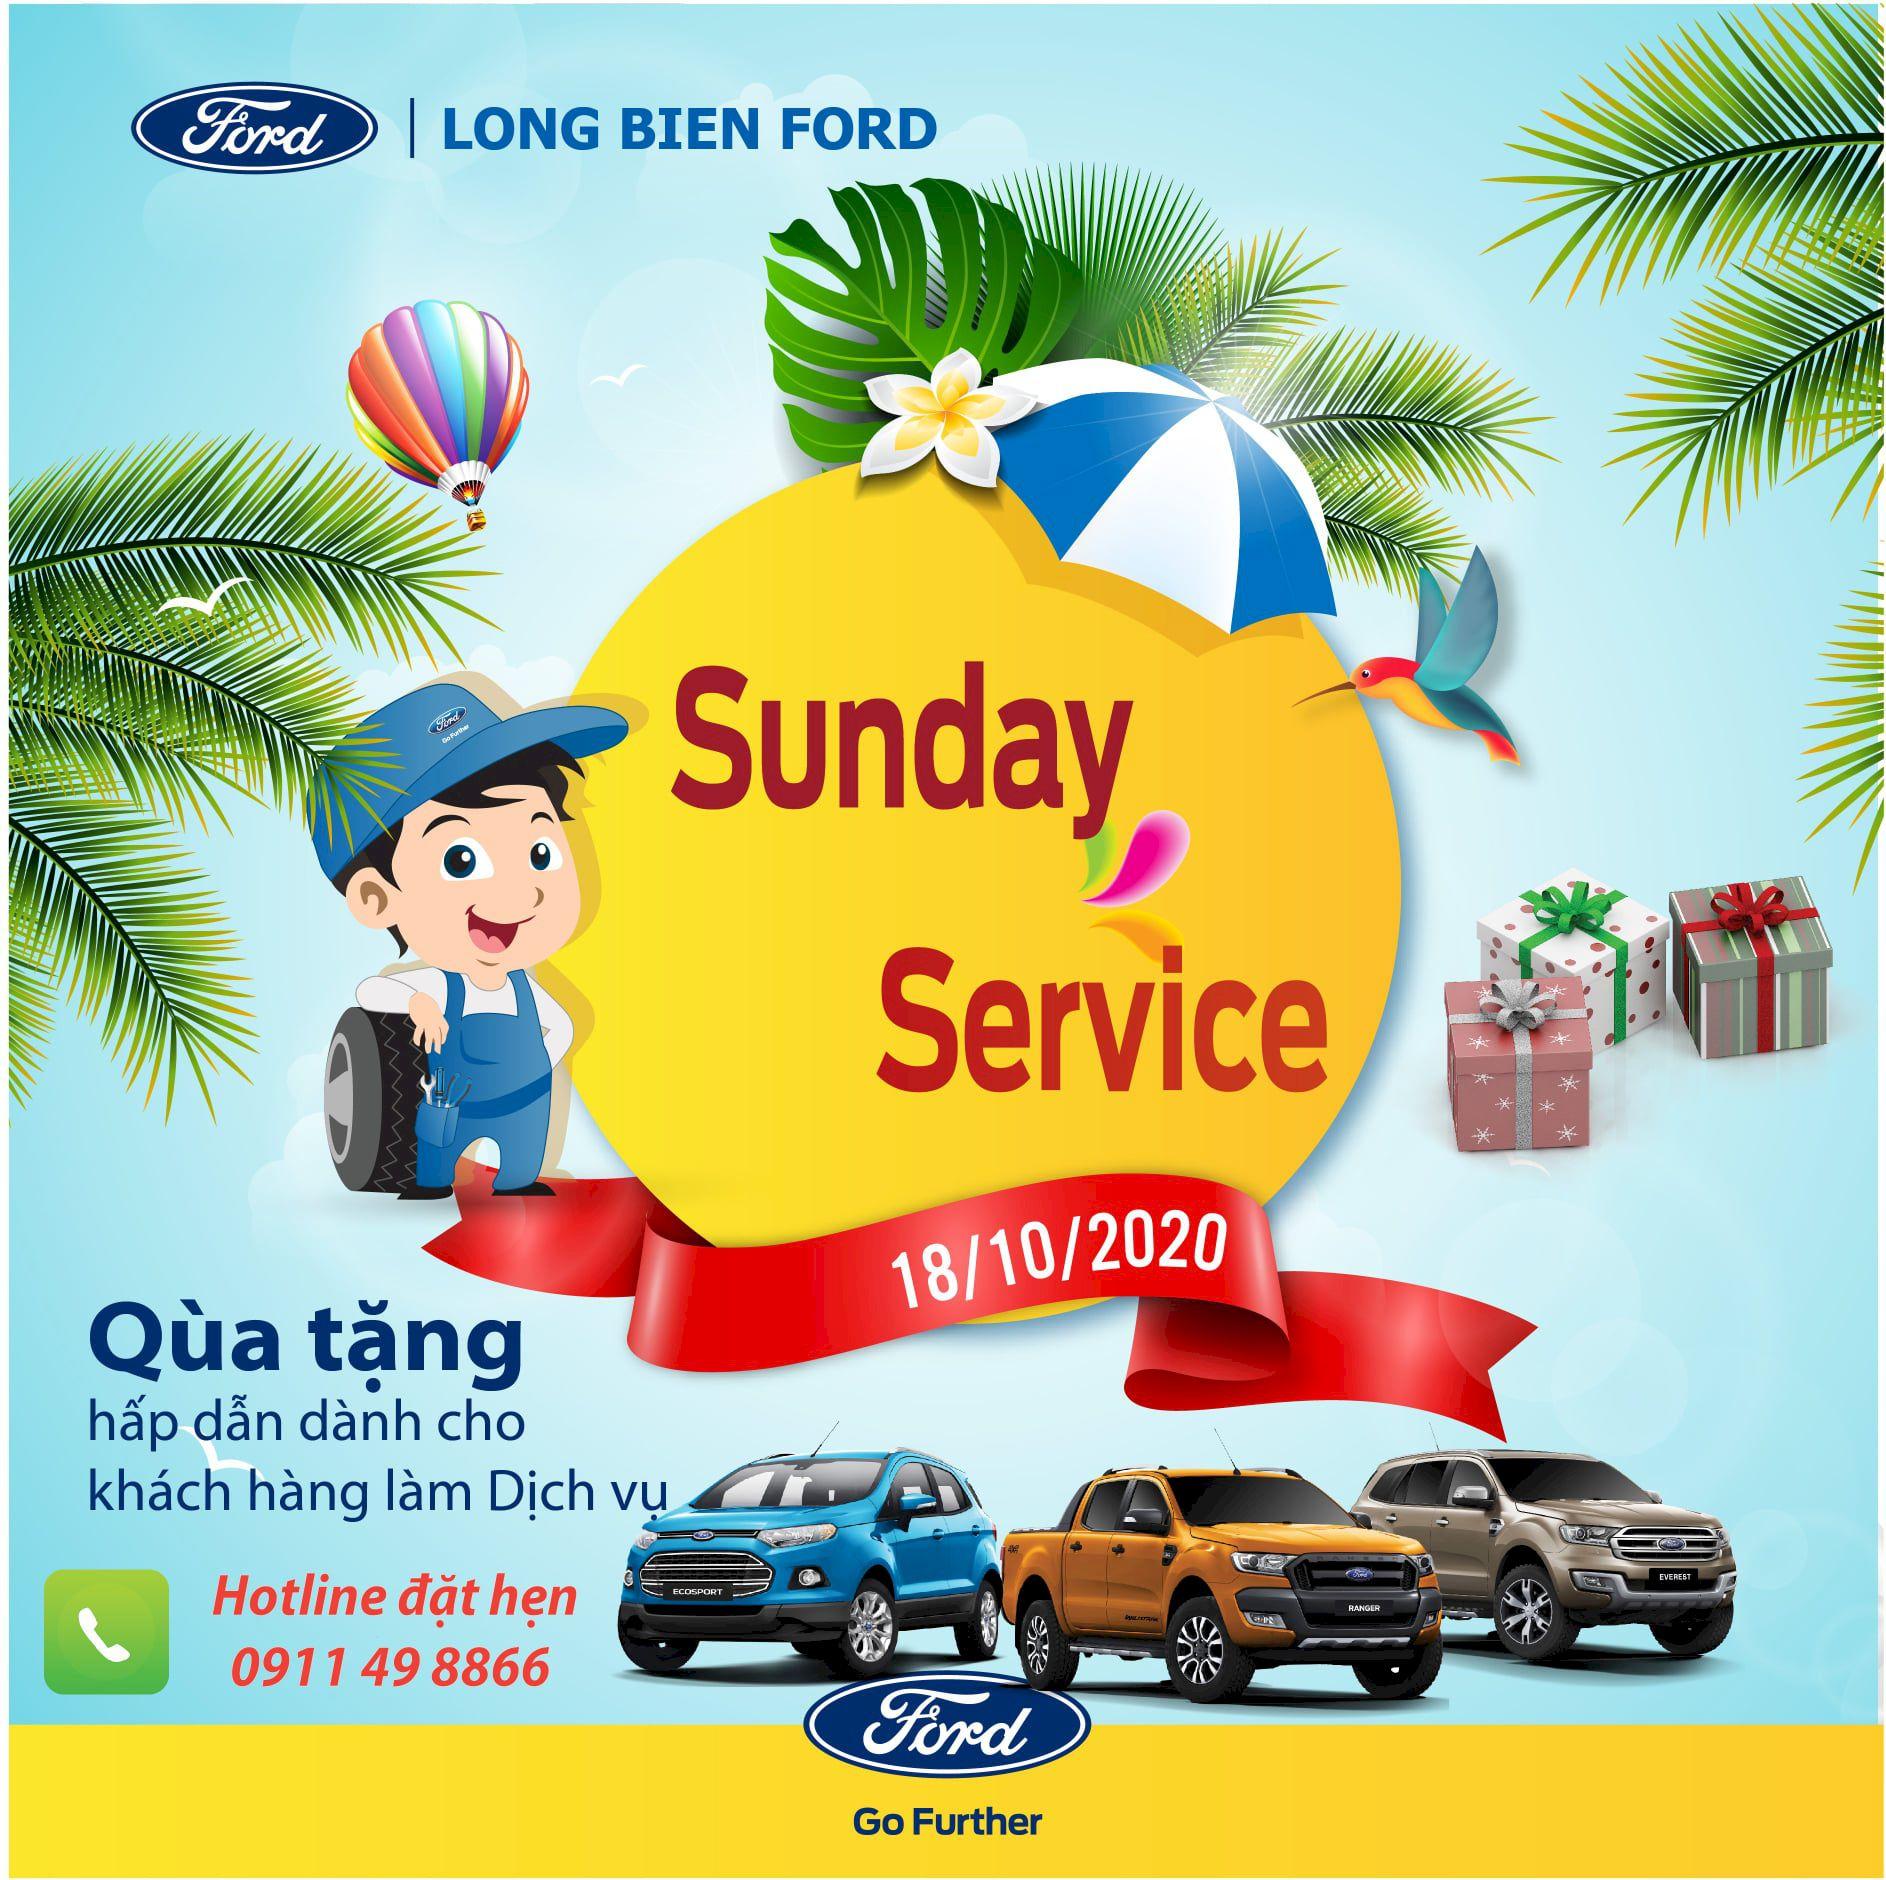 FORD SUNDAY SERVICE THÁNG 10 (18/10/2020)